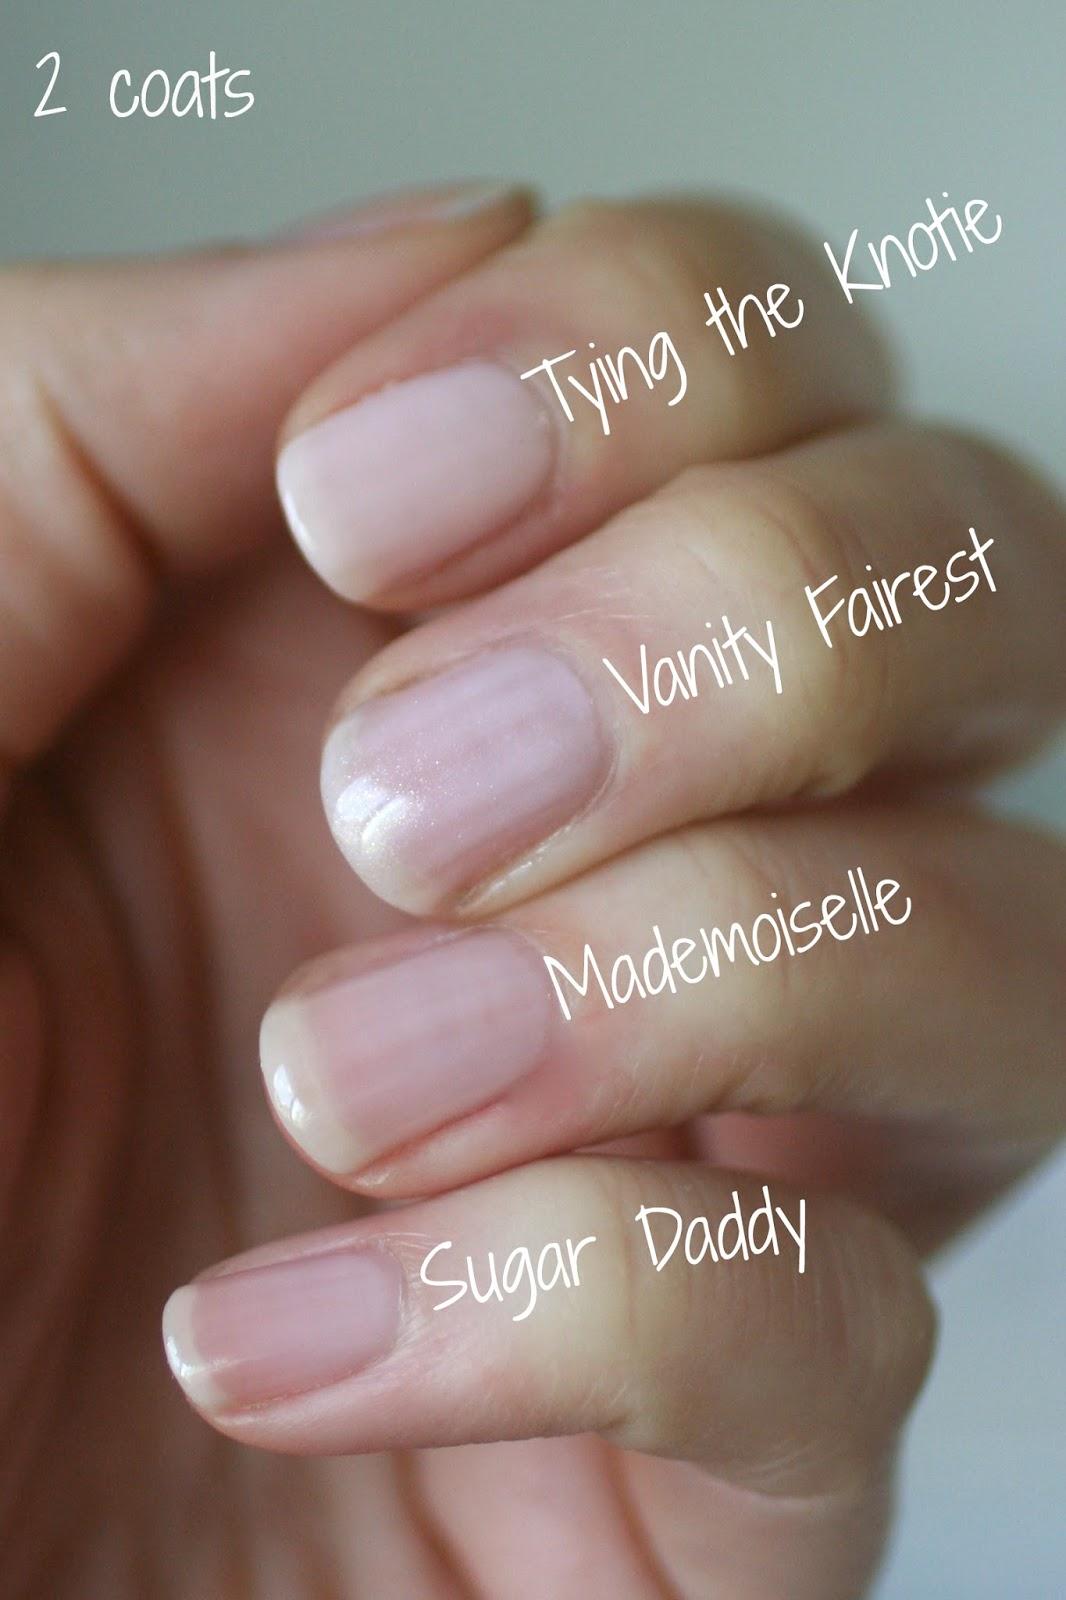 How to treat a sugar daddy